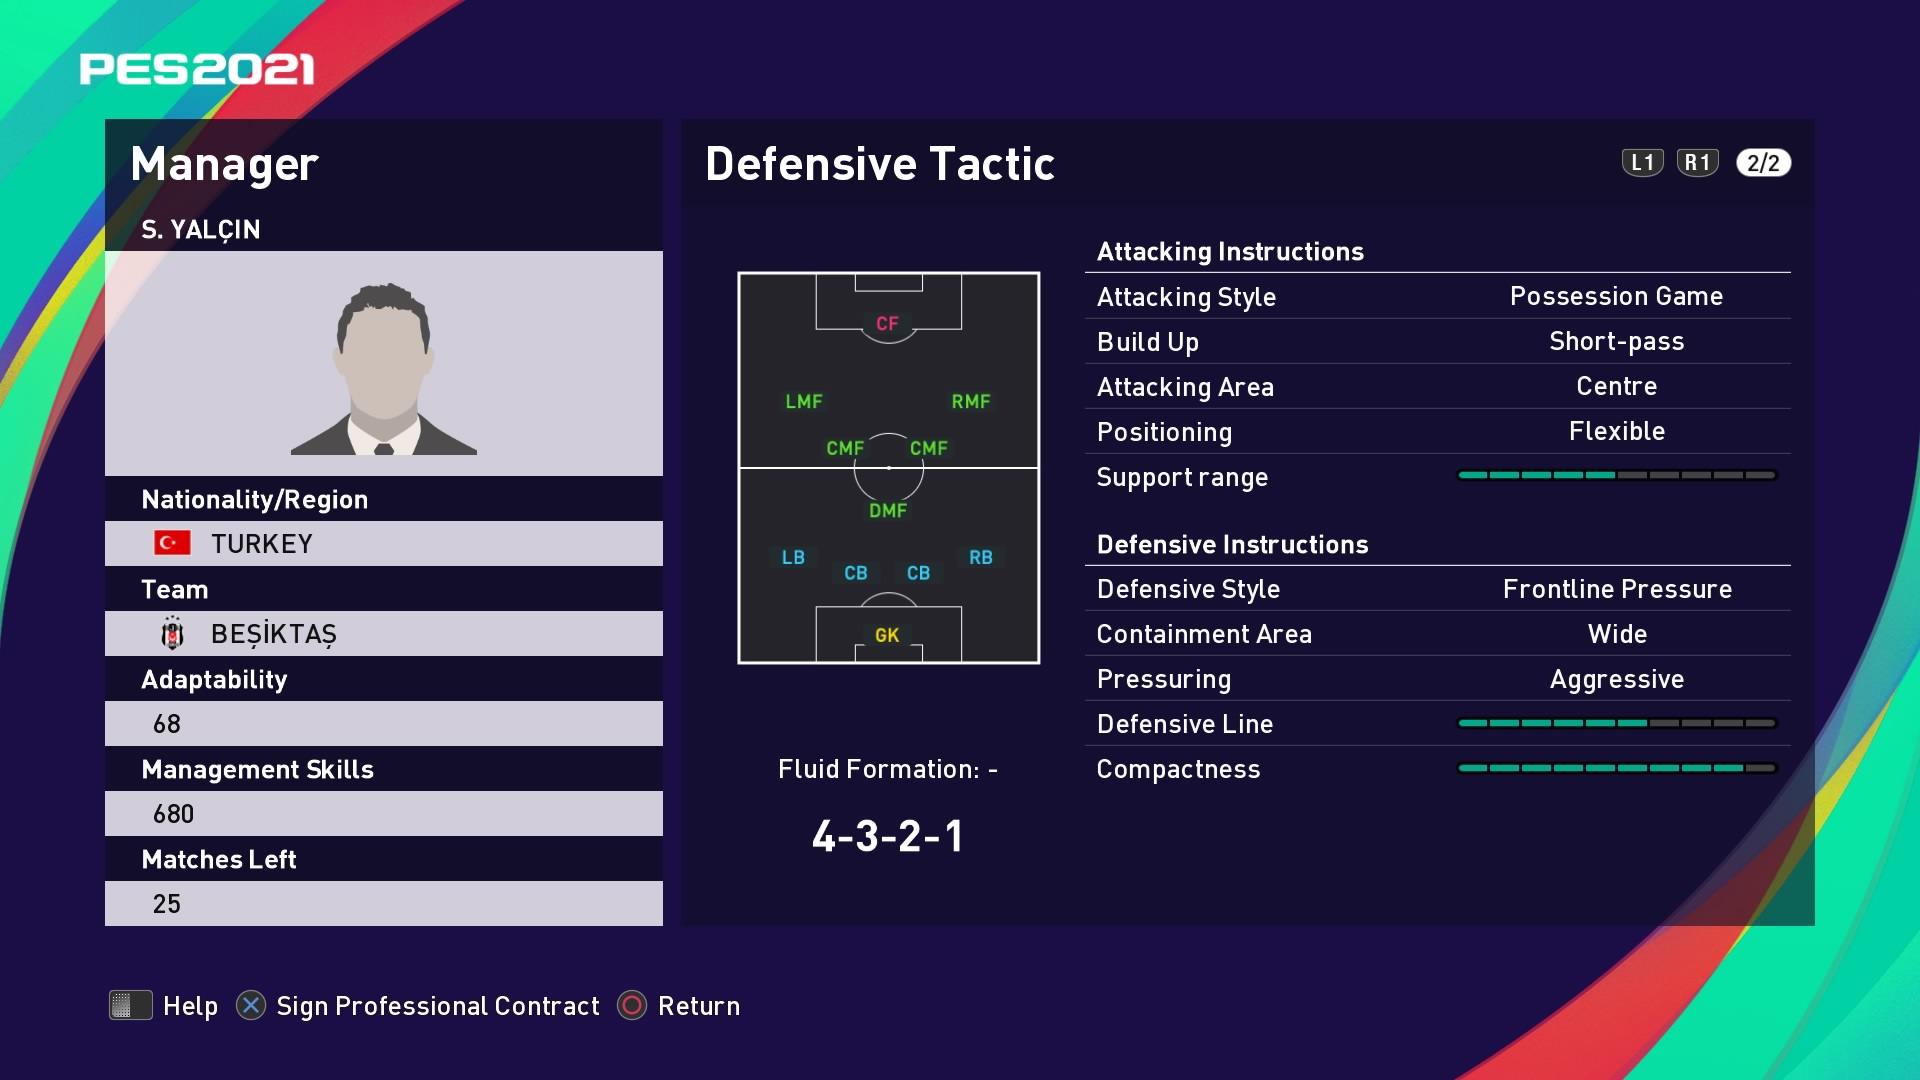 S. Yalçın (Sergen Yalçın) Defensive Tactic in PES 2021 myClub